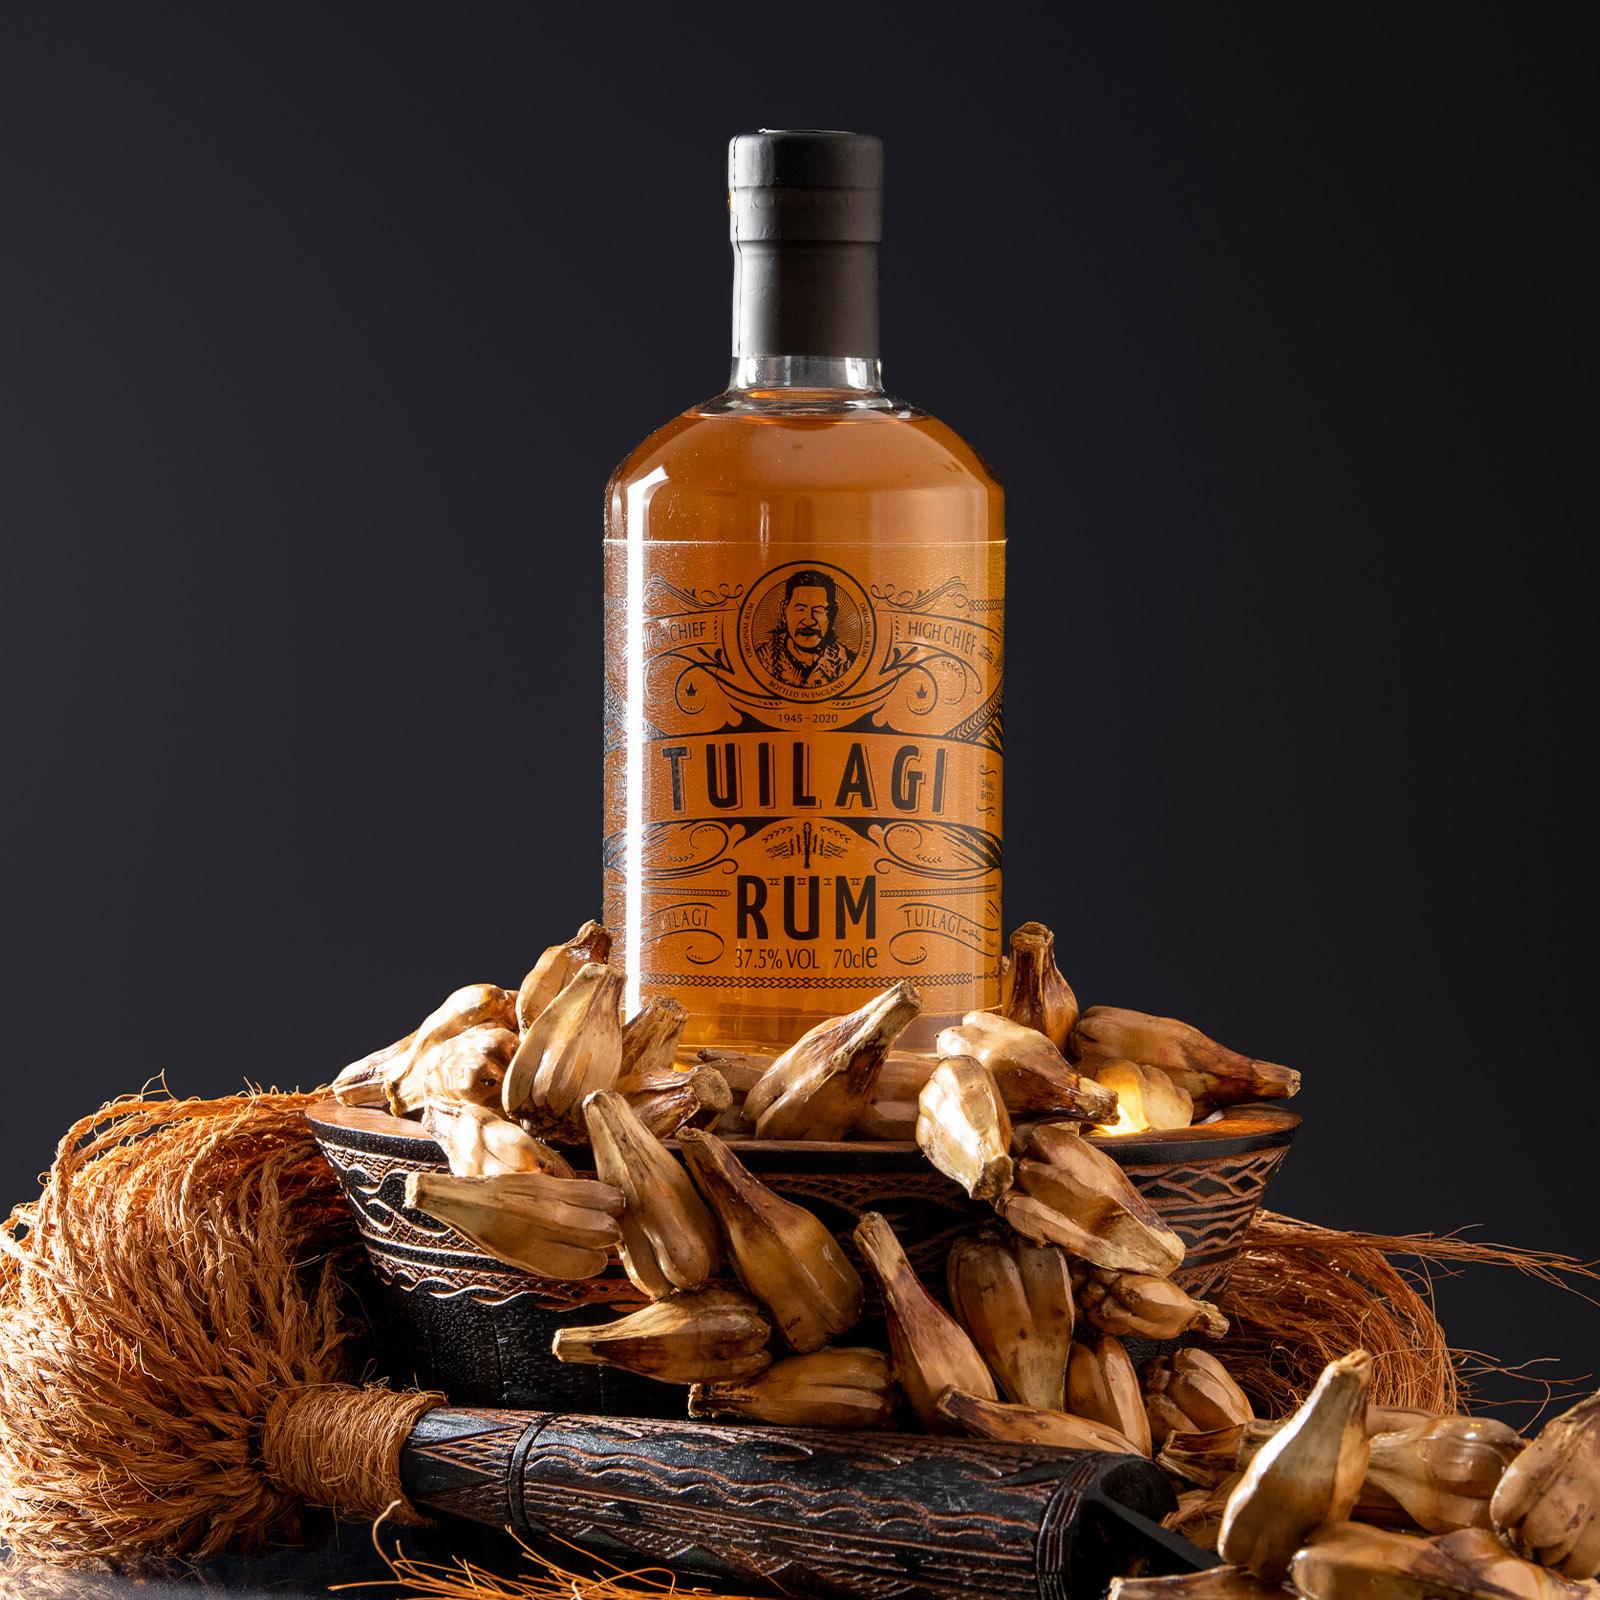 Tuilagi Rum